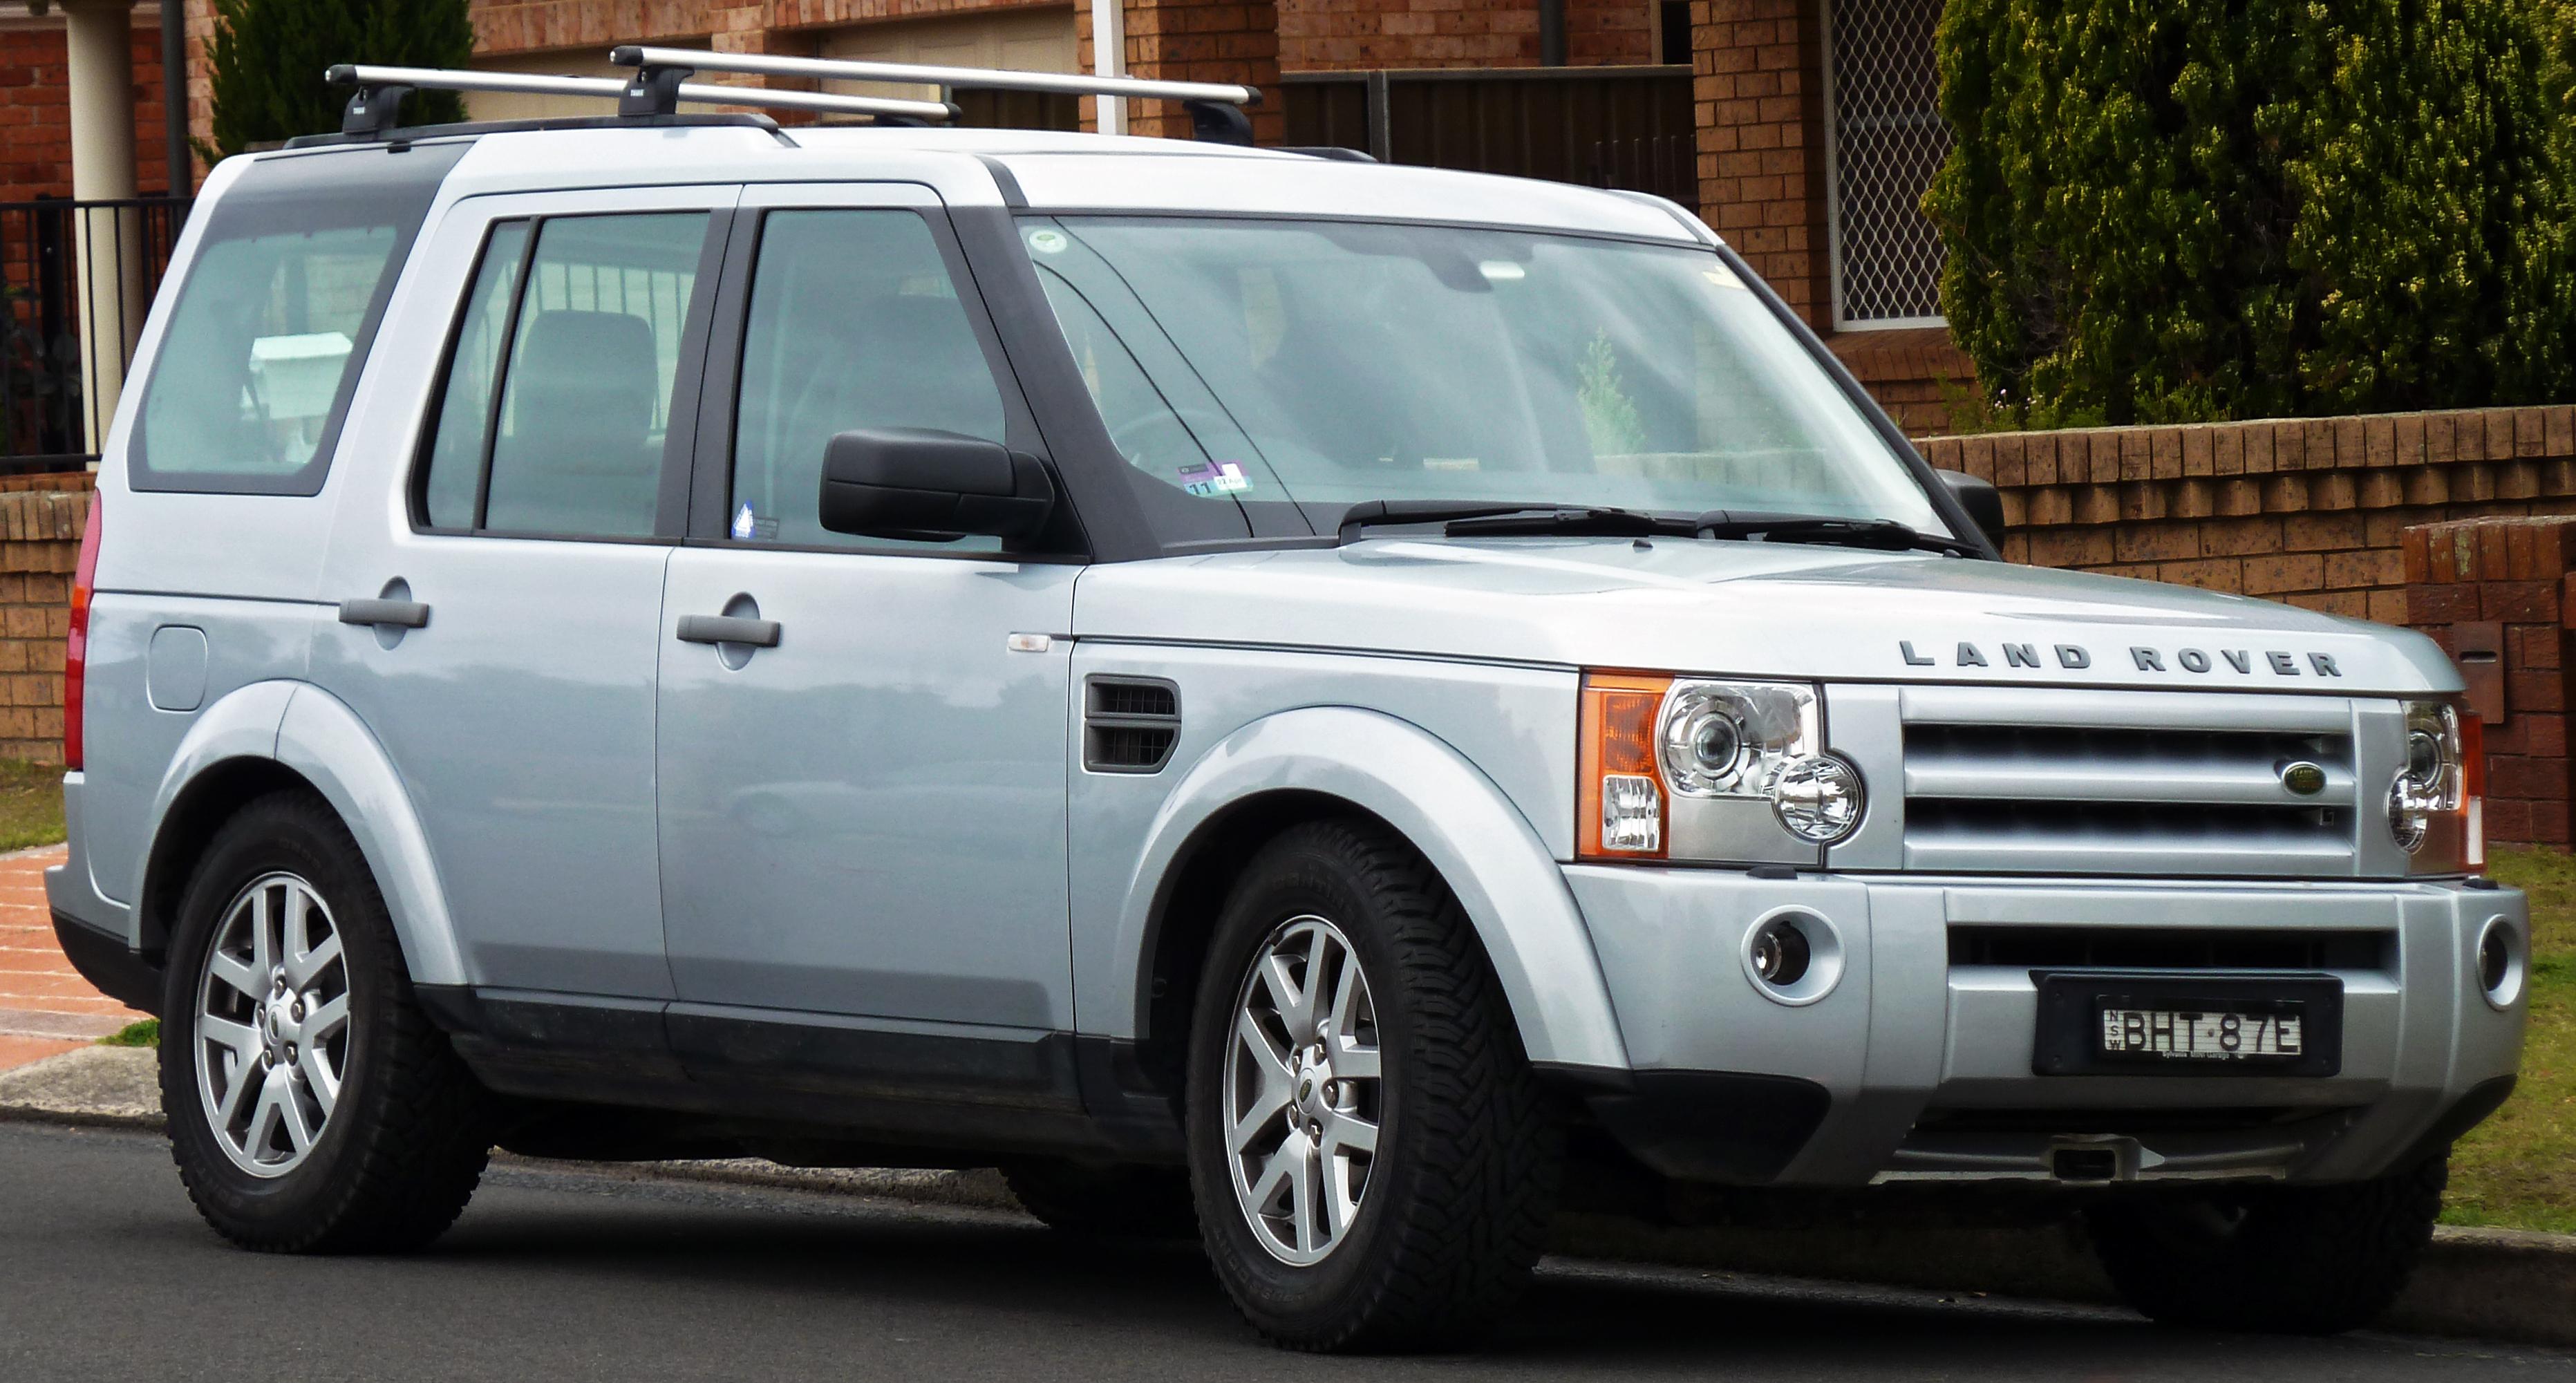 https://upload.wikimedia.org/wikipedia/commons/e/ee/2008-2009_Land_Rover_Discovery_3_%28MY09%29_TDV6_SE_wagon_%282010-09-23%29_01.jpg